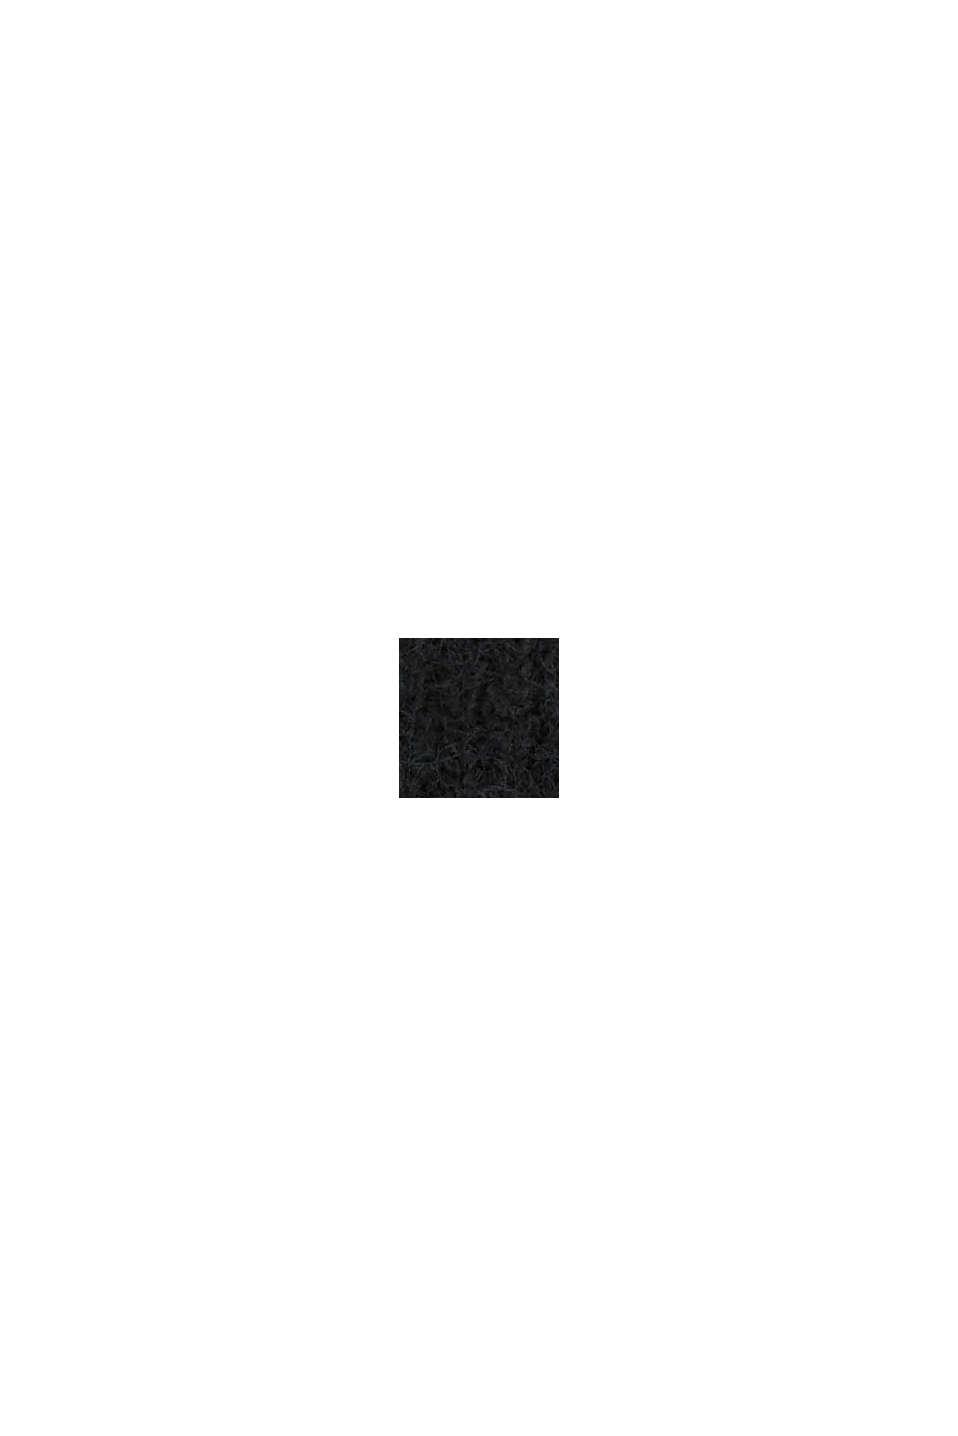 Rib knit beanie in a wool/alpaca blend, BLACK, swatch